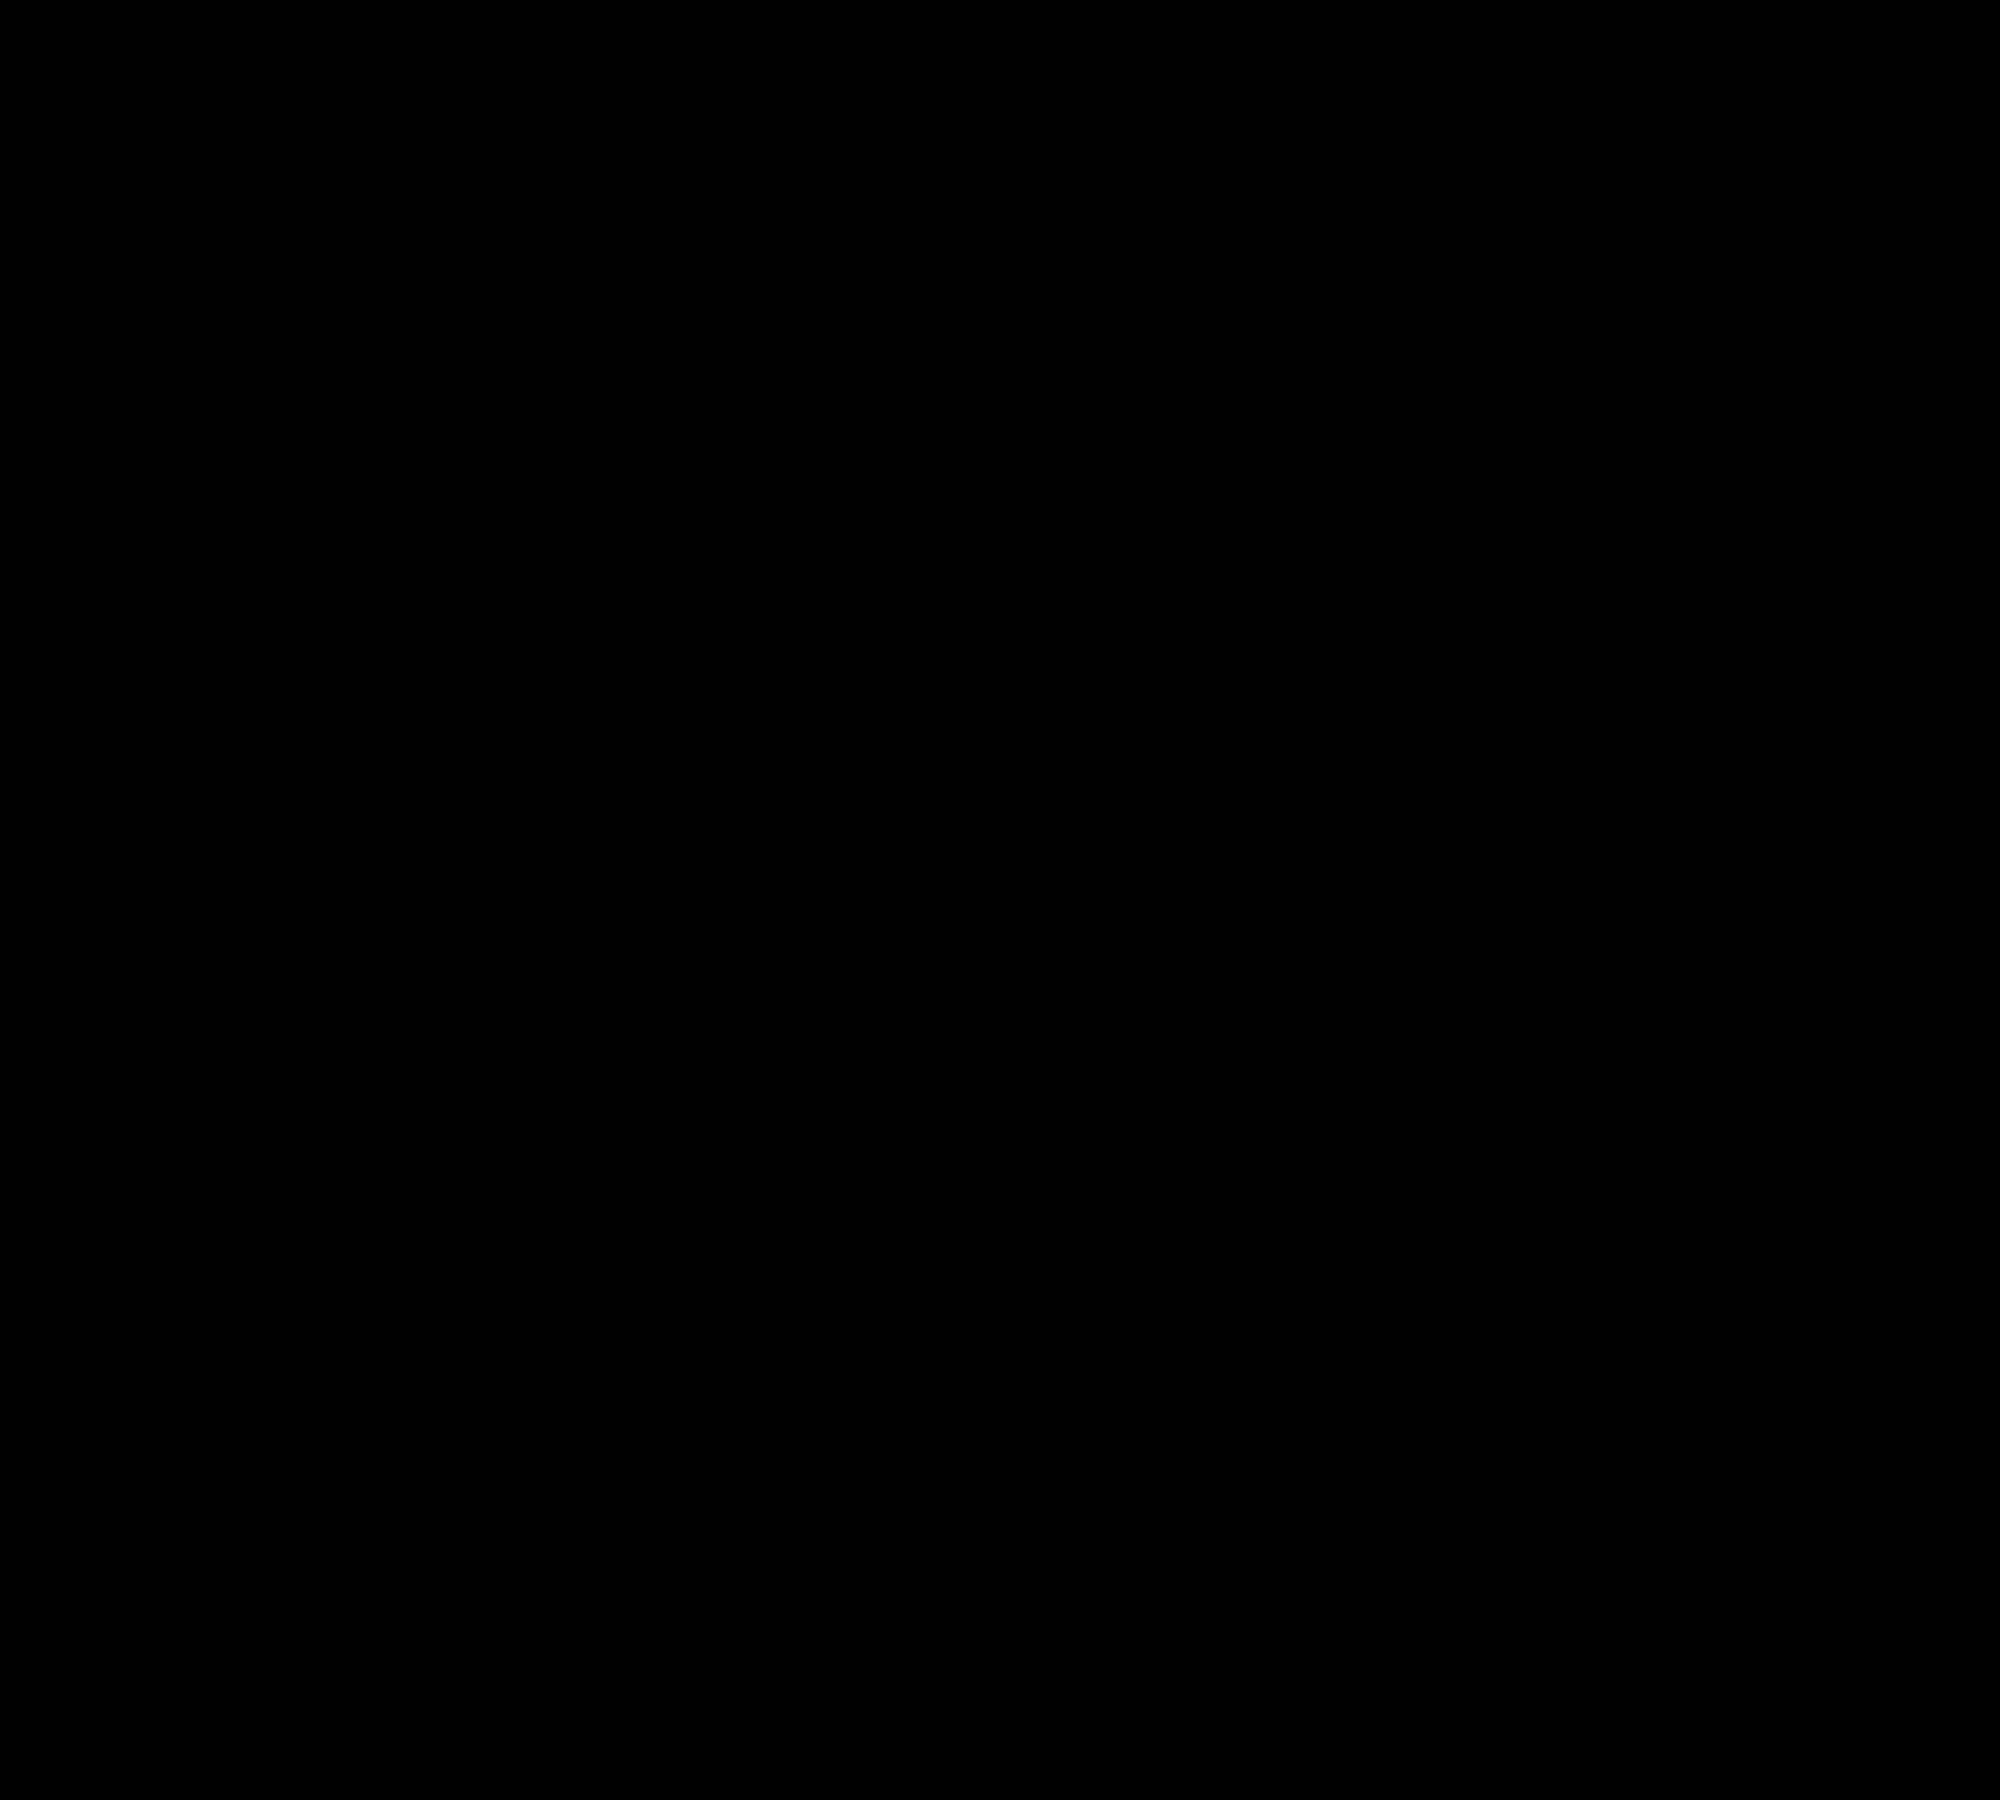 1971 Vw Karmann Ghia Wiring Diagram